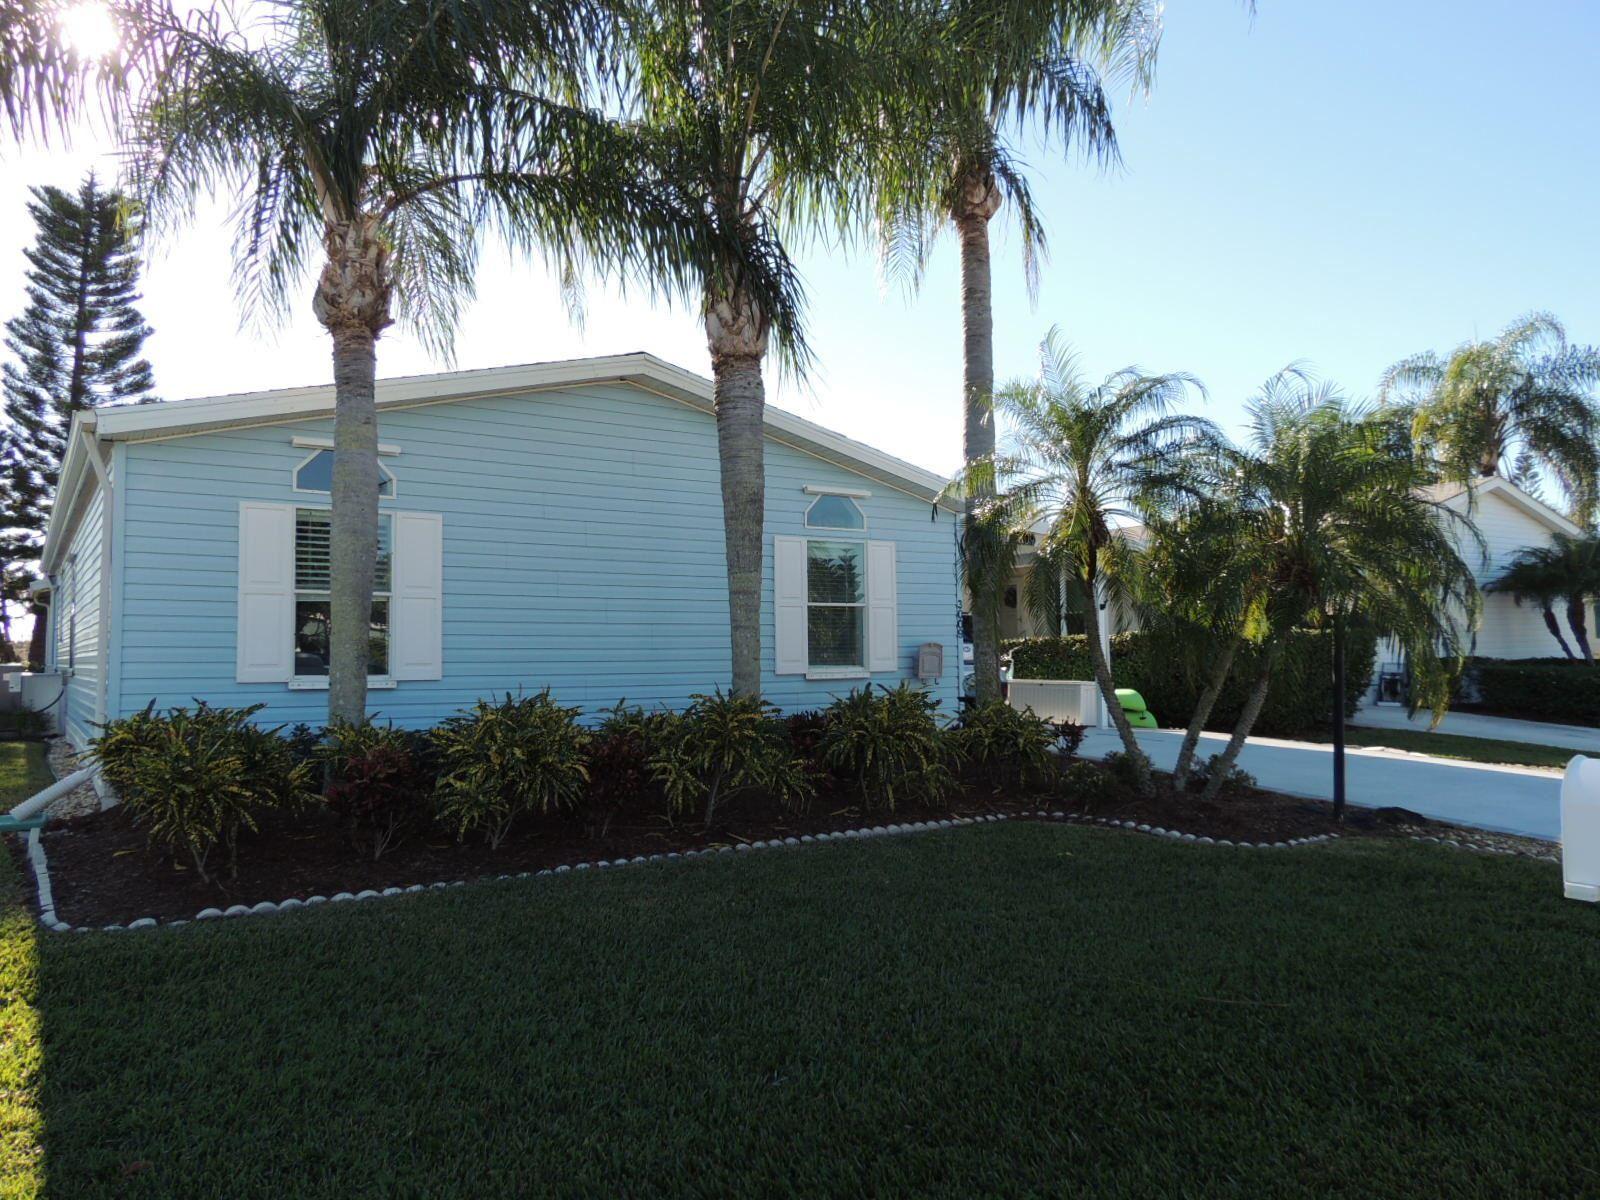 3009 Satinleaf Lane, Port Saint Lucie, FL 34952 - MLS#: RX-10682320